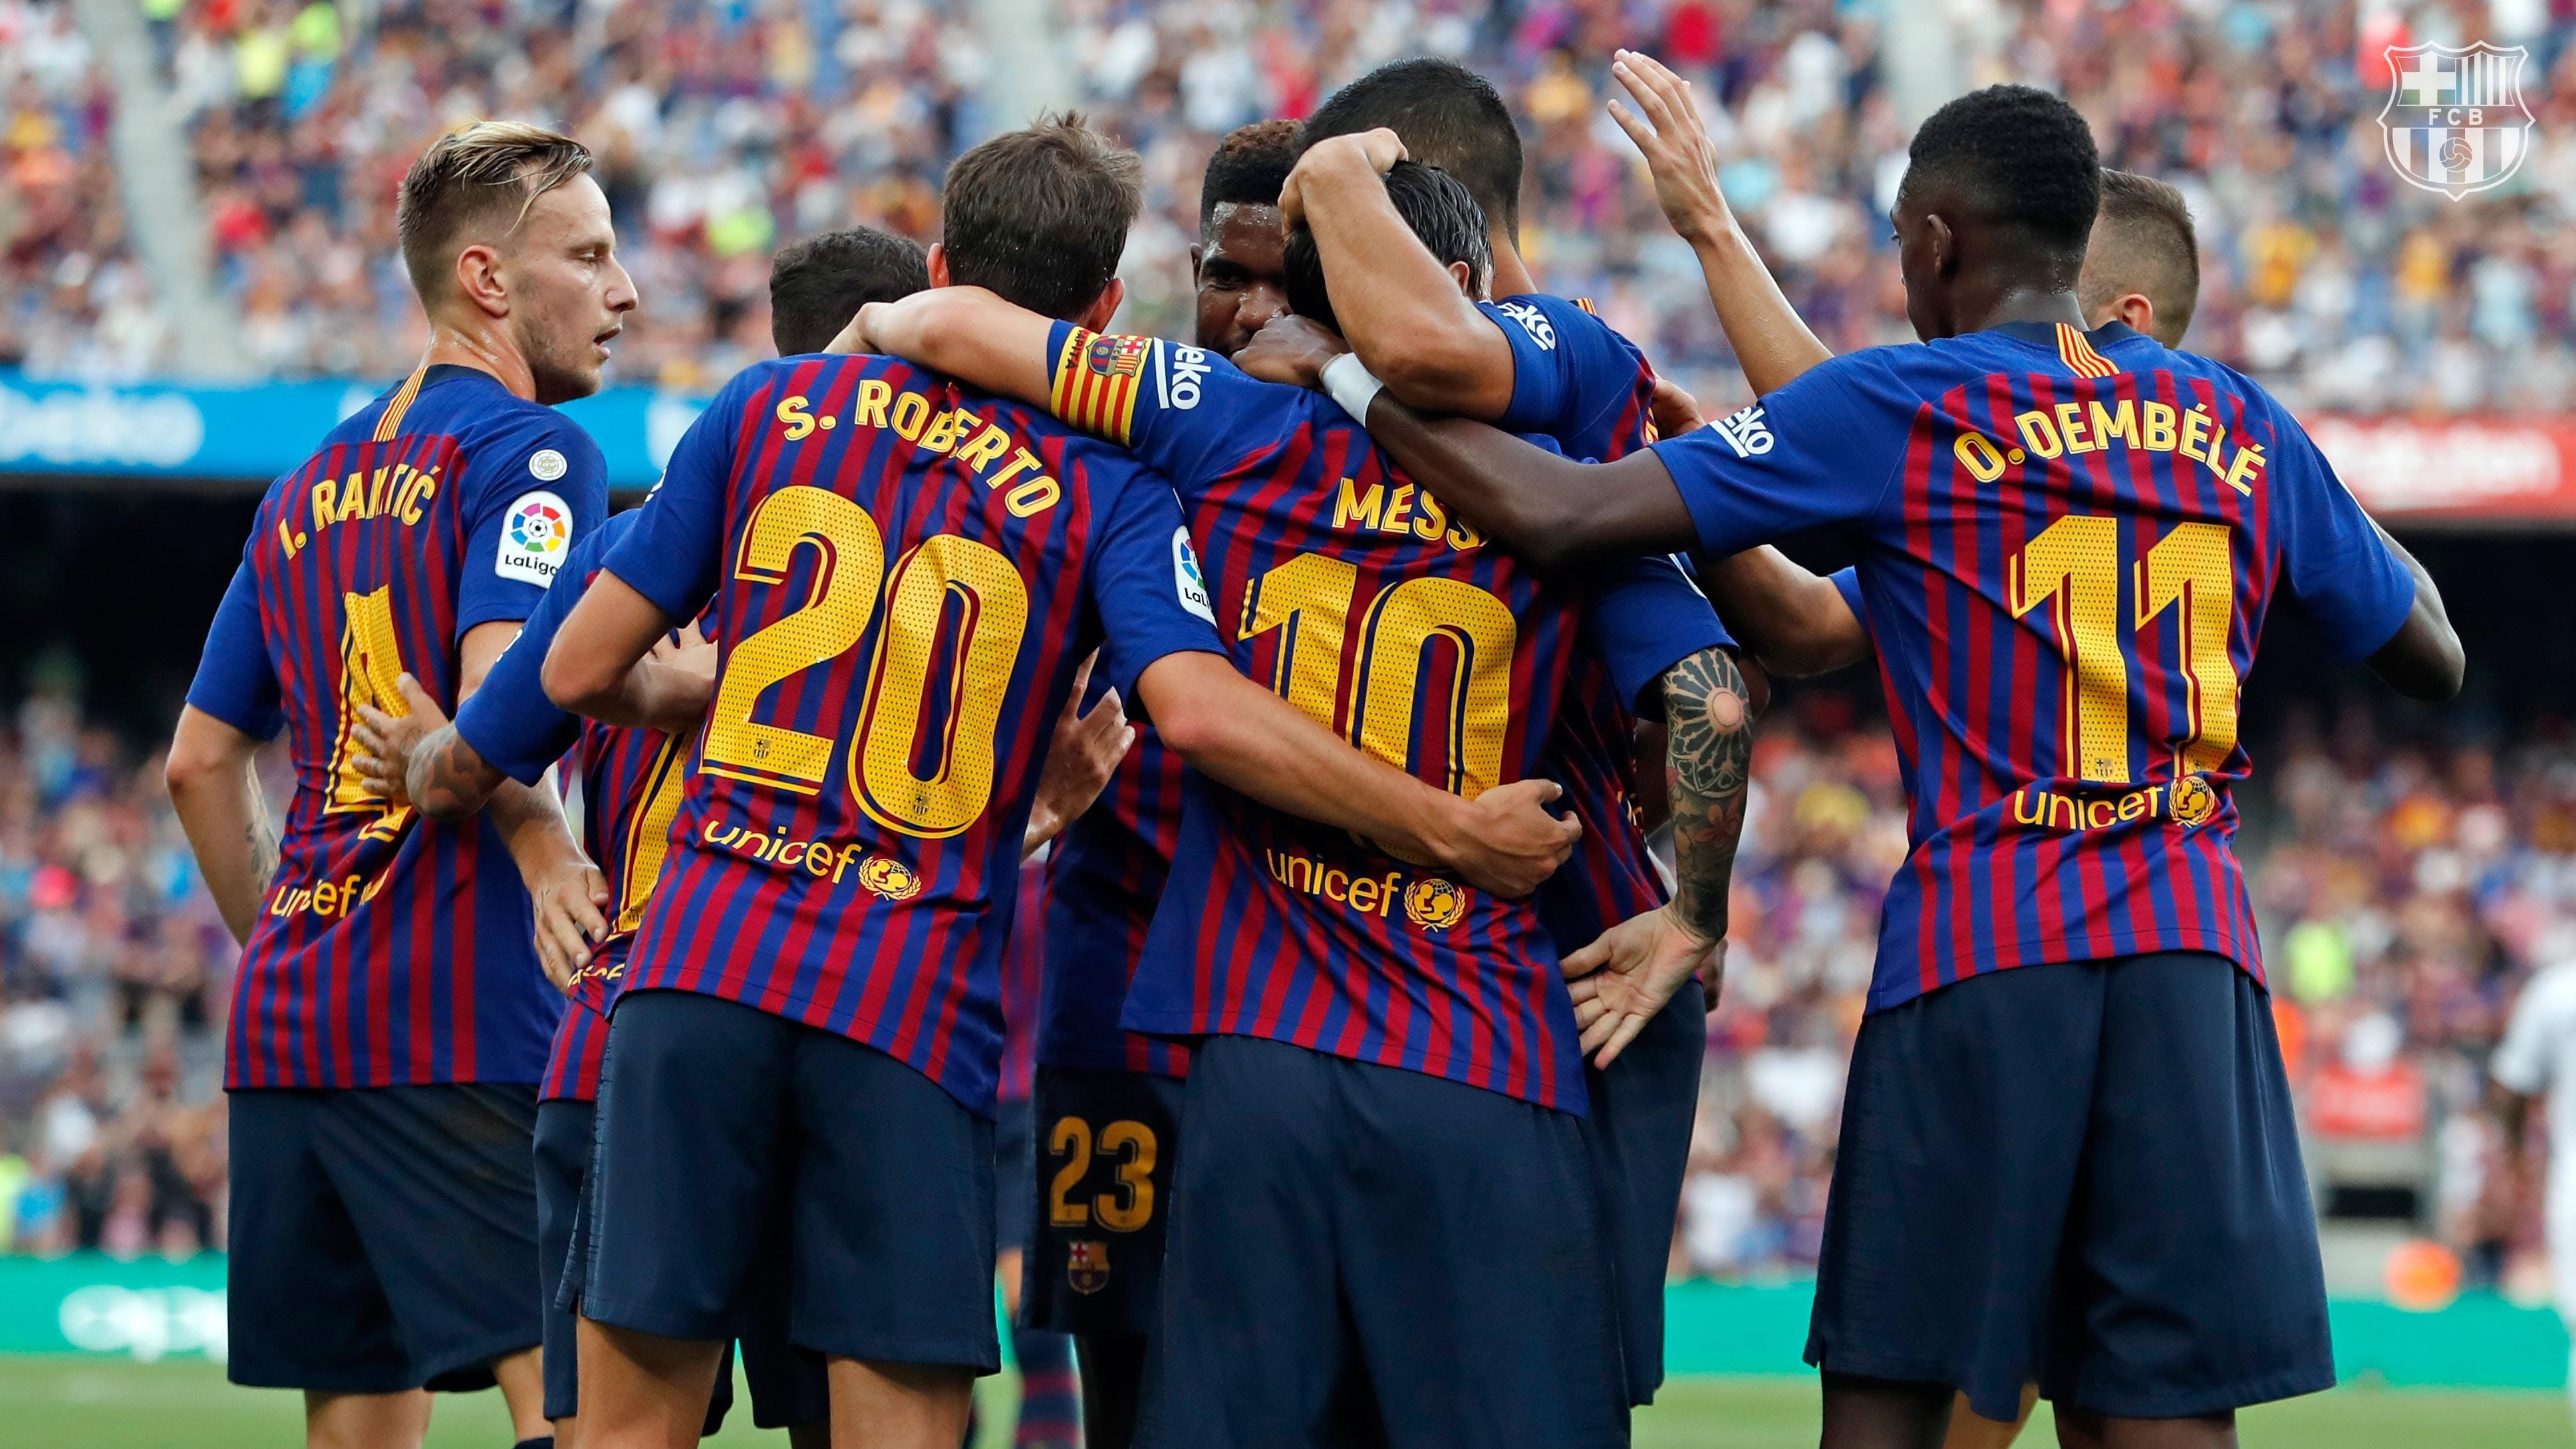 FC Barcelona v Club Atltico de Madrid - VIP Hospitality Tickets